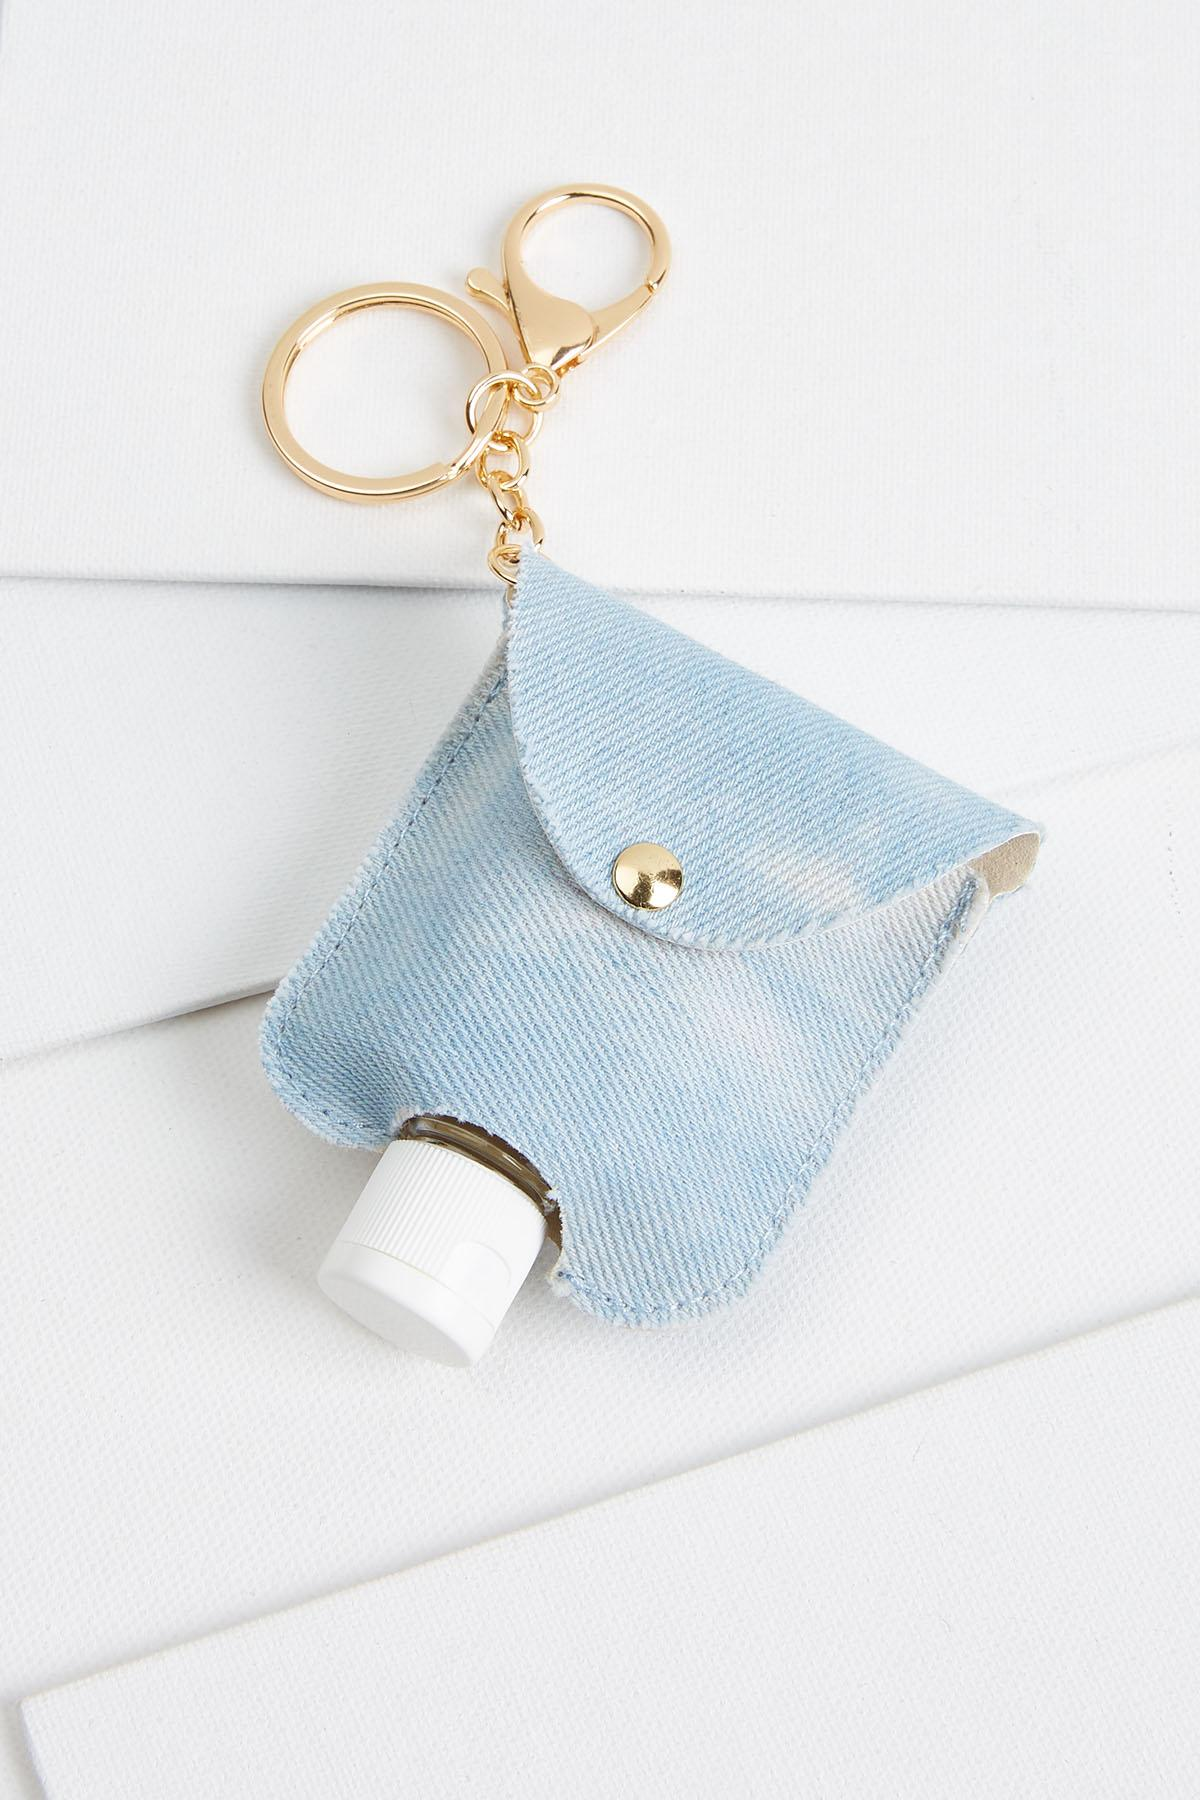 Denim Sanitizer Keychain